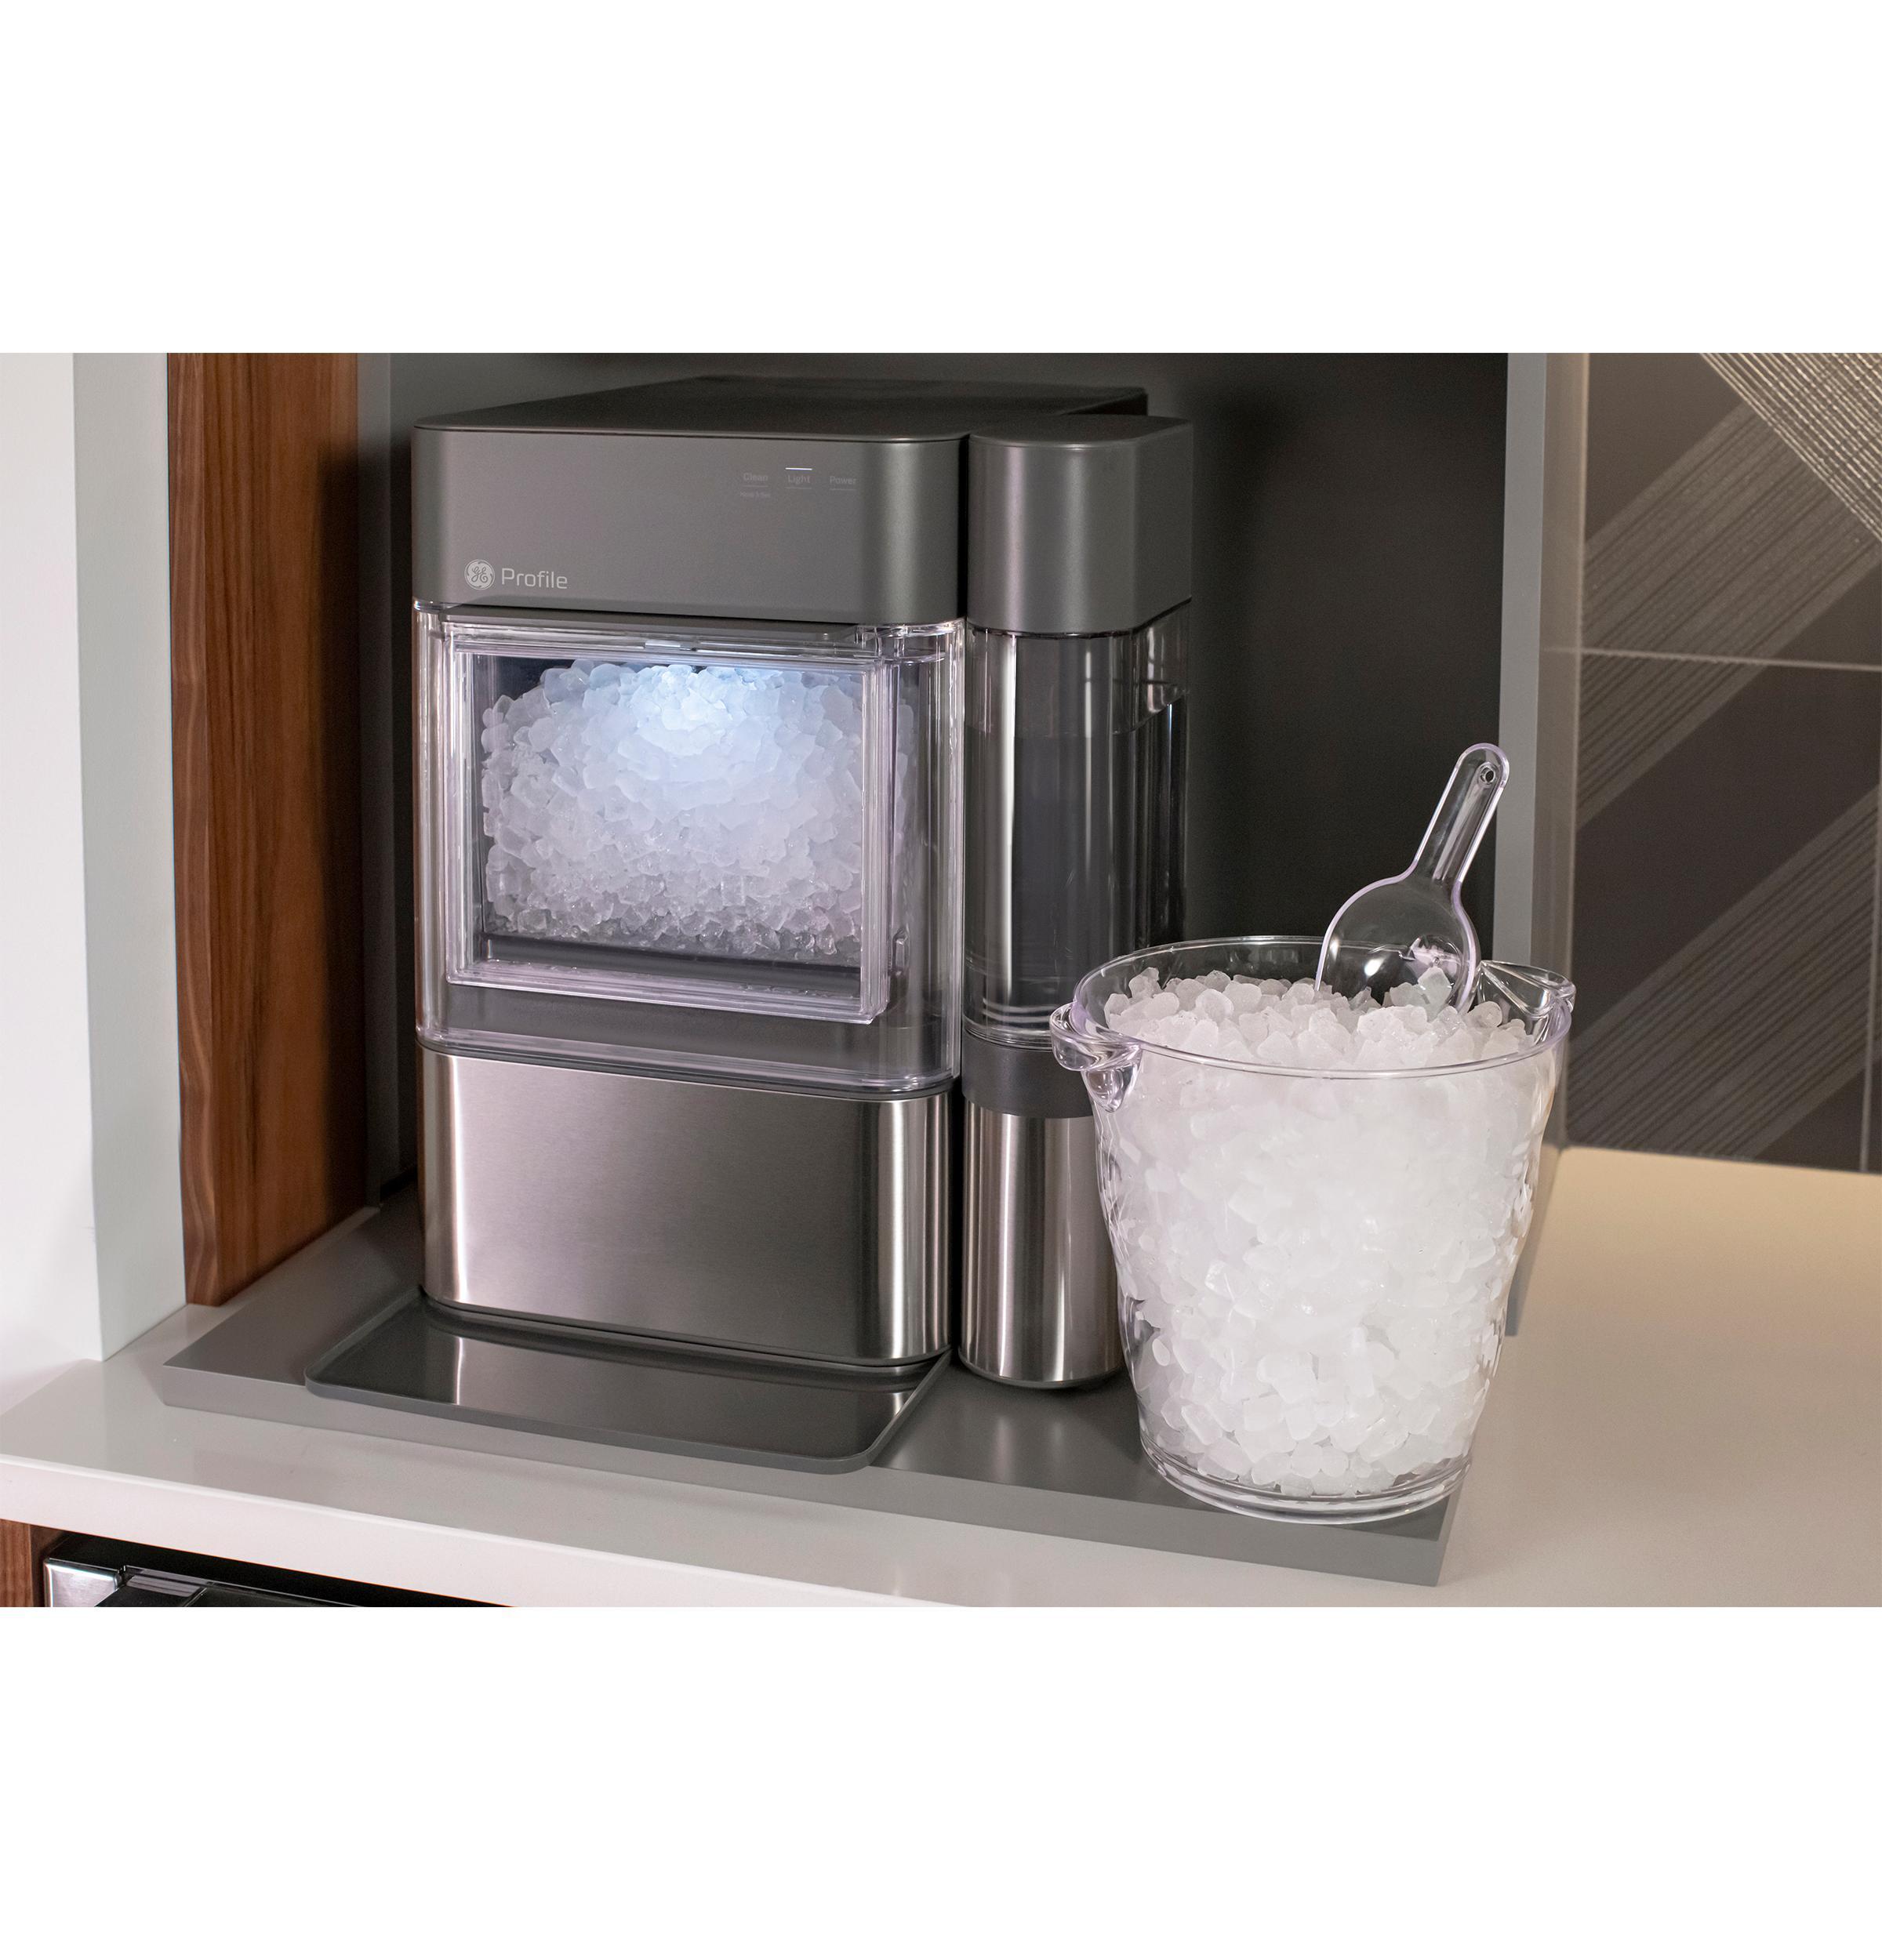 Xpio13bcbt Ge Profile Ge Profile Opal 2 0 Nugget Ice Maker Black Stainless Manuel Joseph Appliance Center